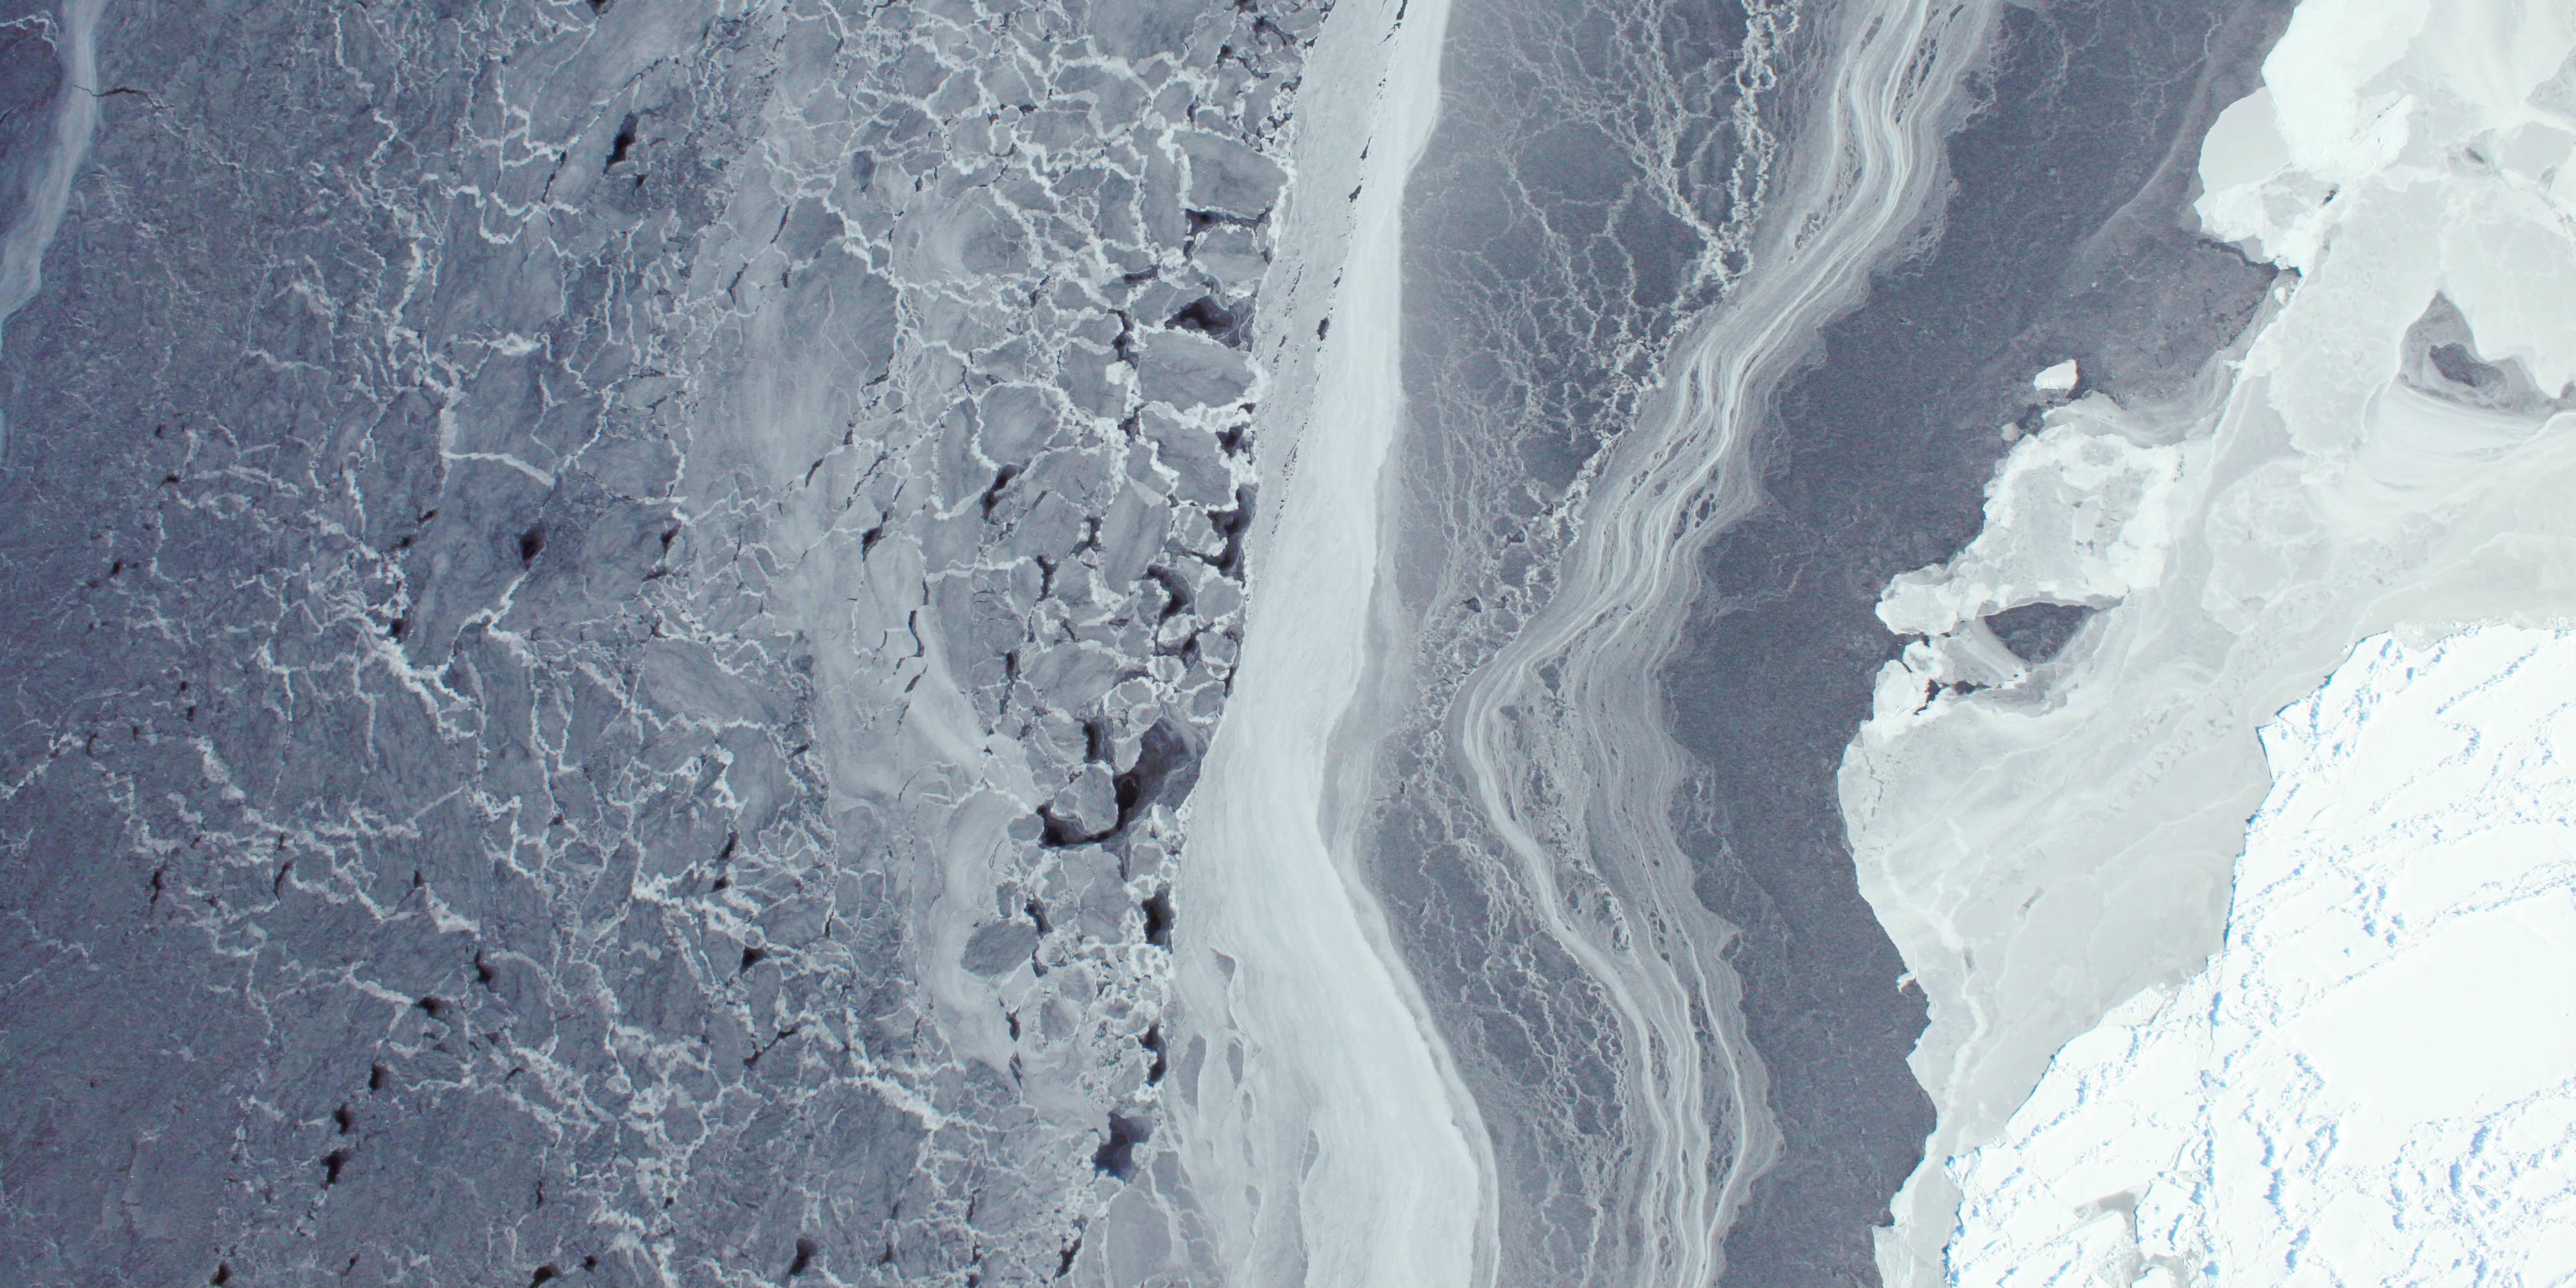 NASA - Antarctic ice break-up